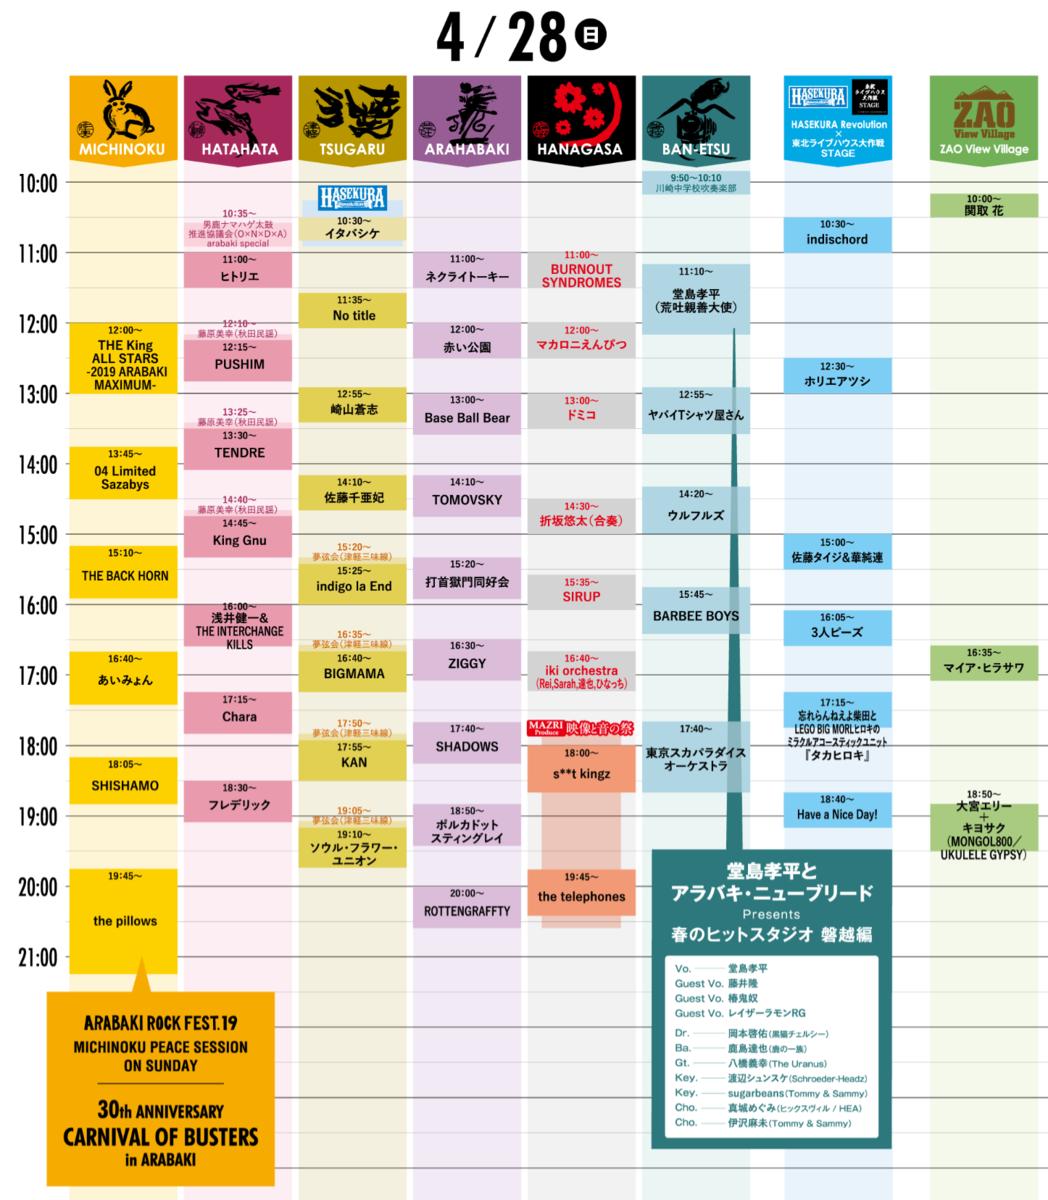 ARABAKI ROCK FEST2019,5月28日タイムテーブル